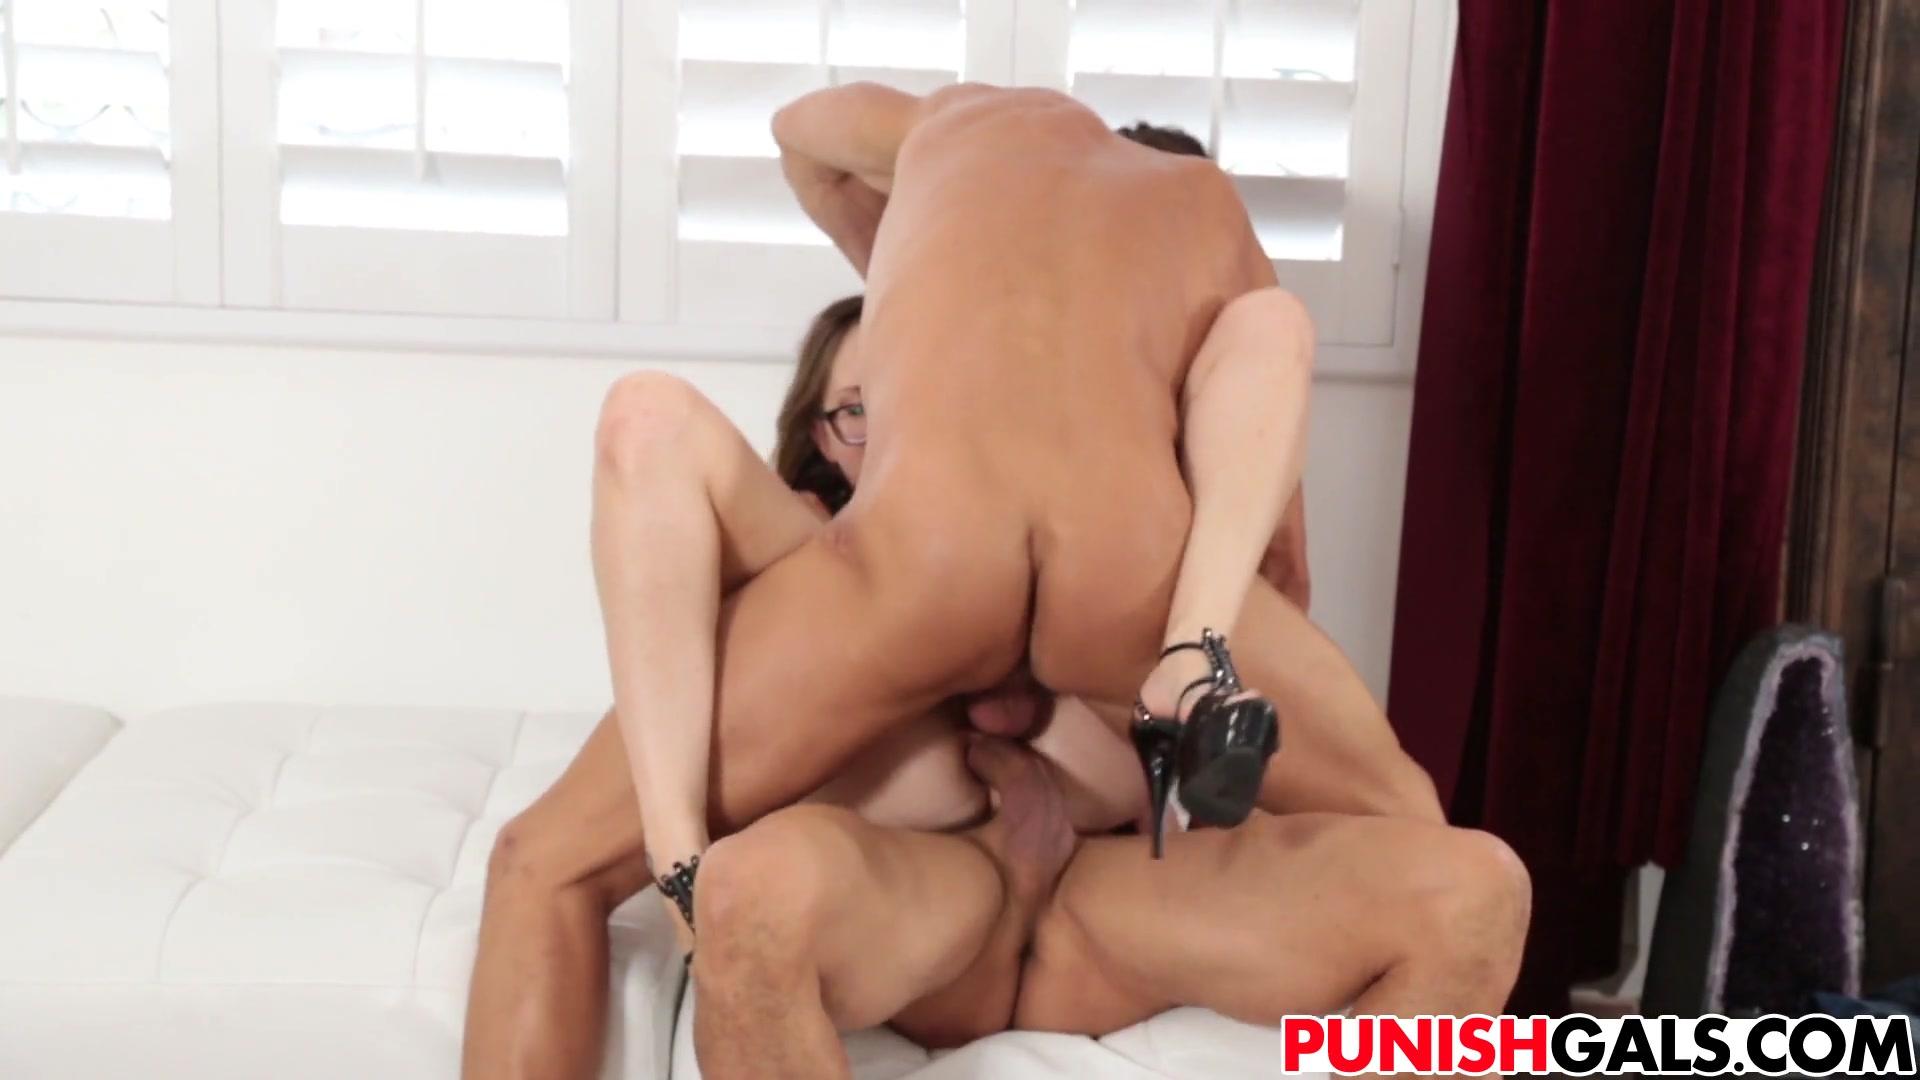 Cheating slut gets double penetrated Hot girls striptez